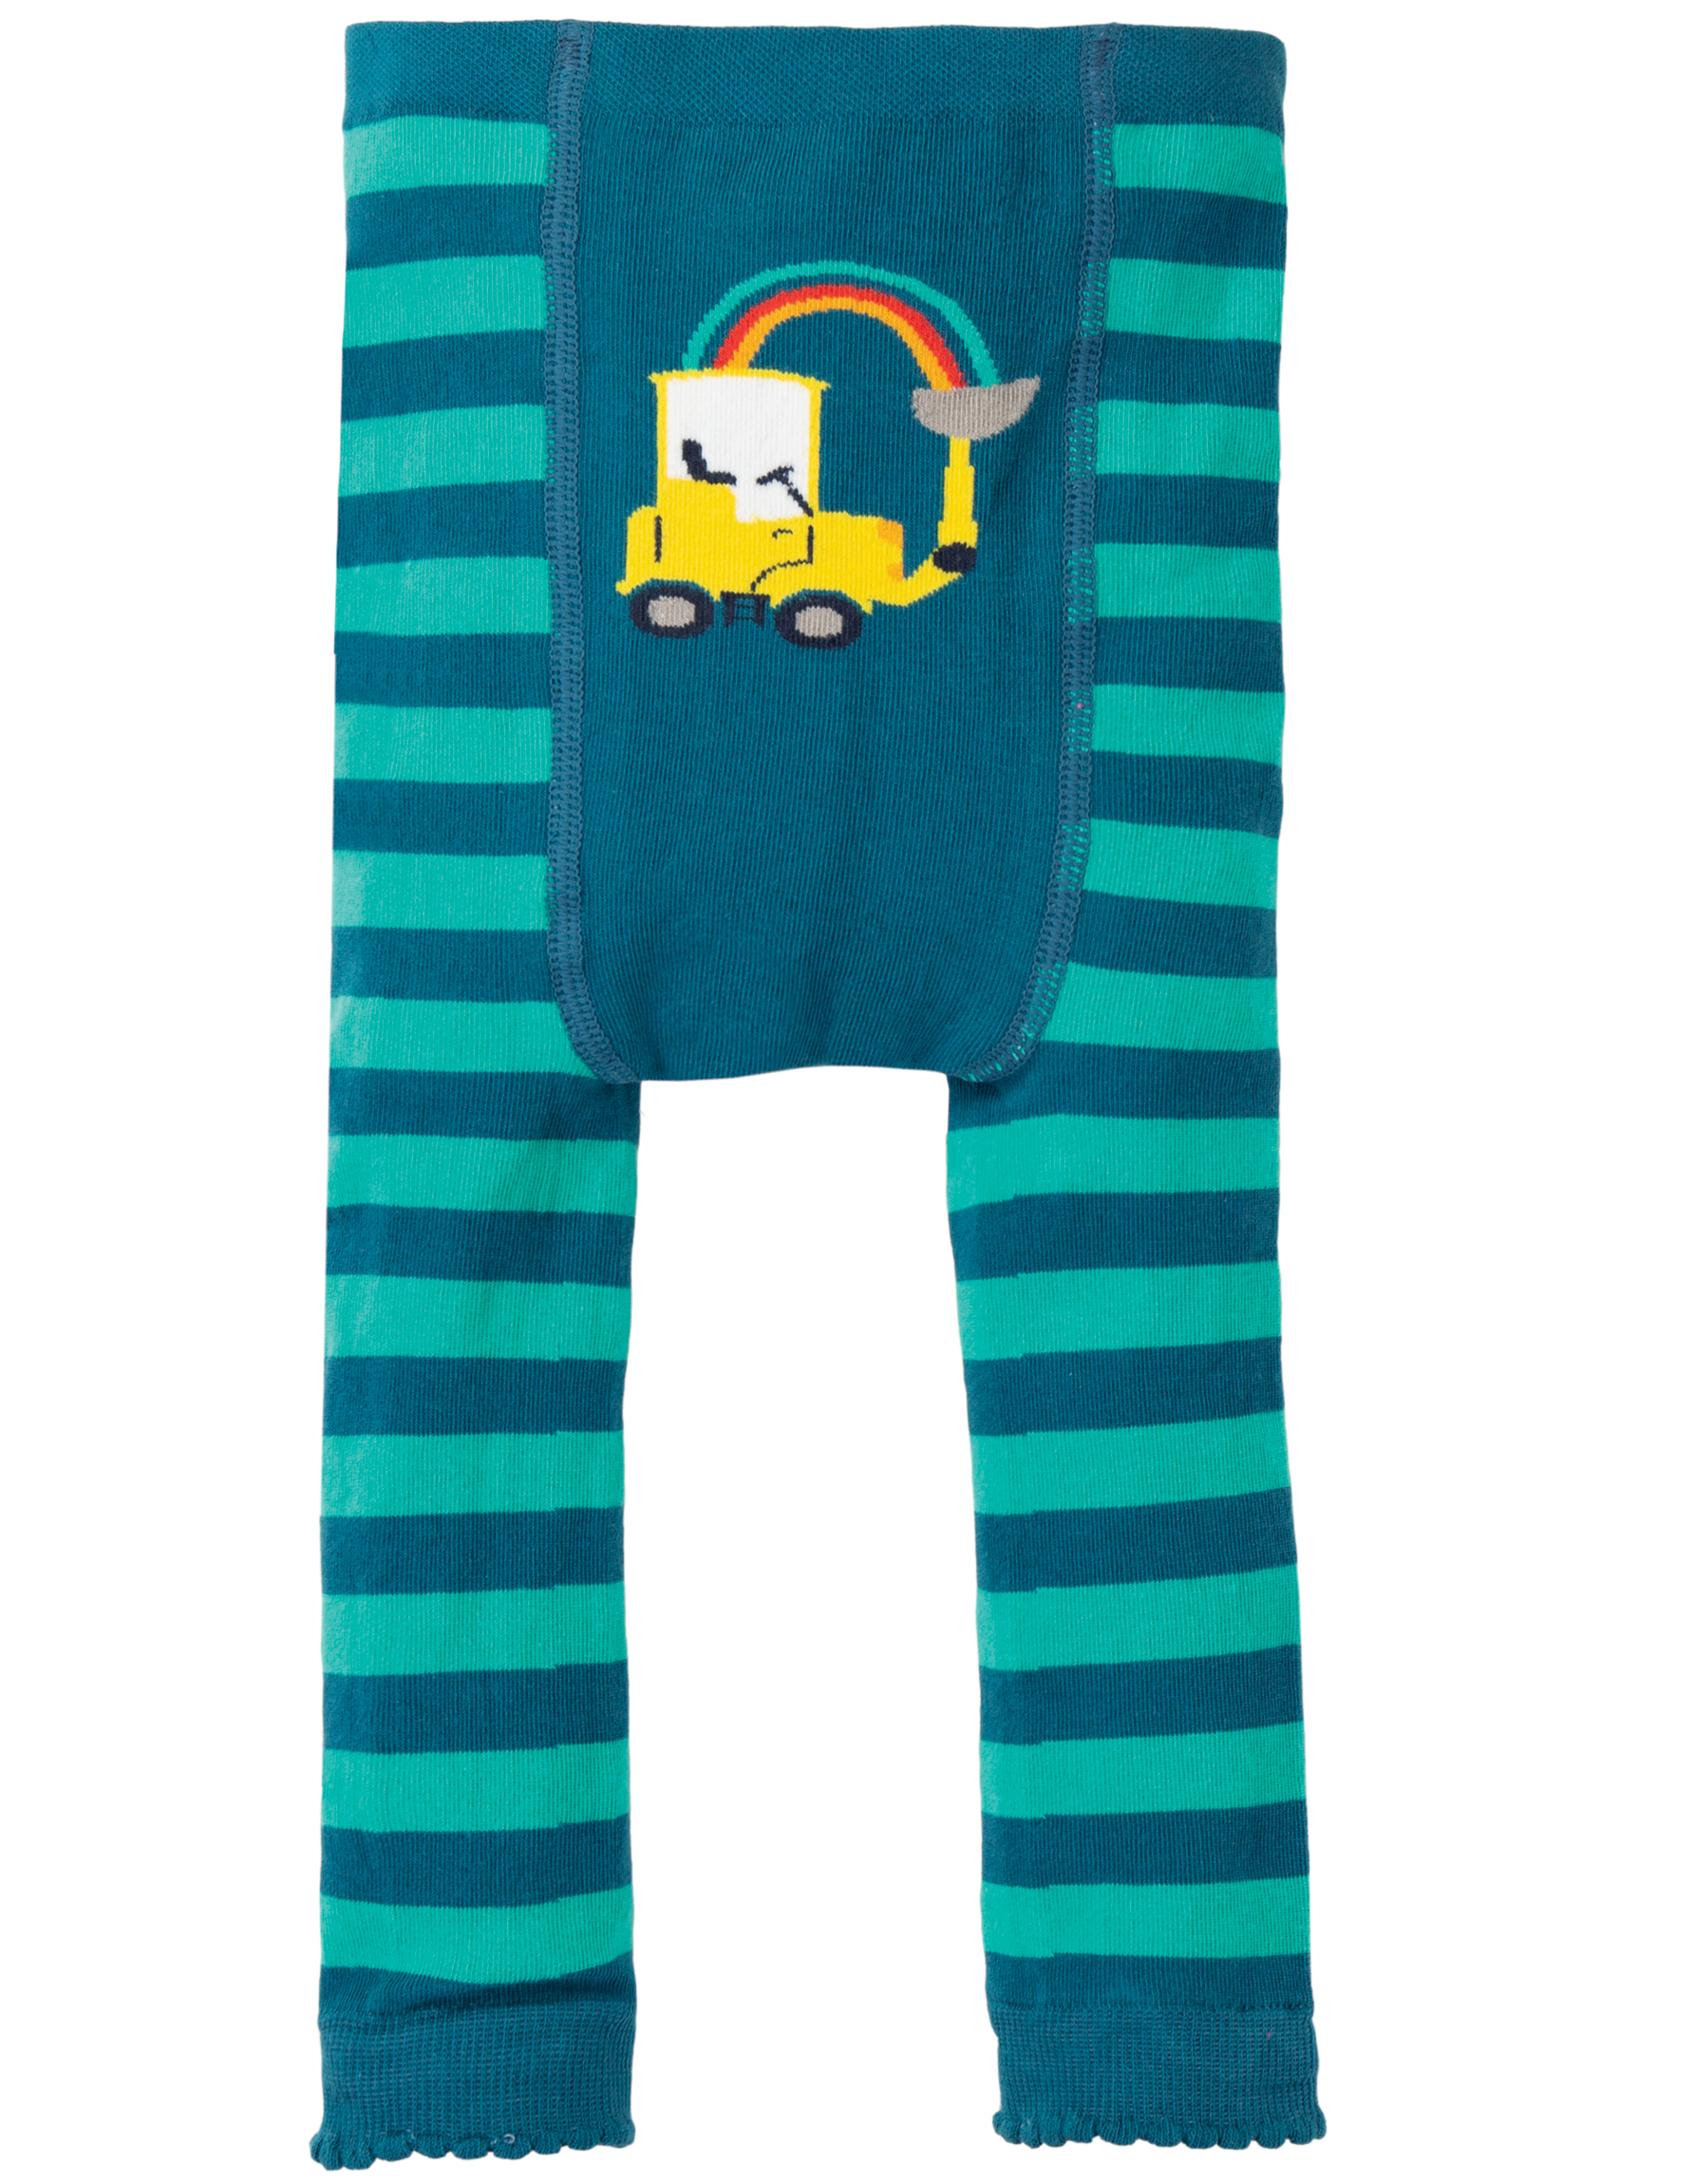 Frugi - fun knitted leggings - Pacific aqua/tractor